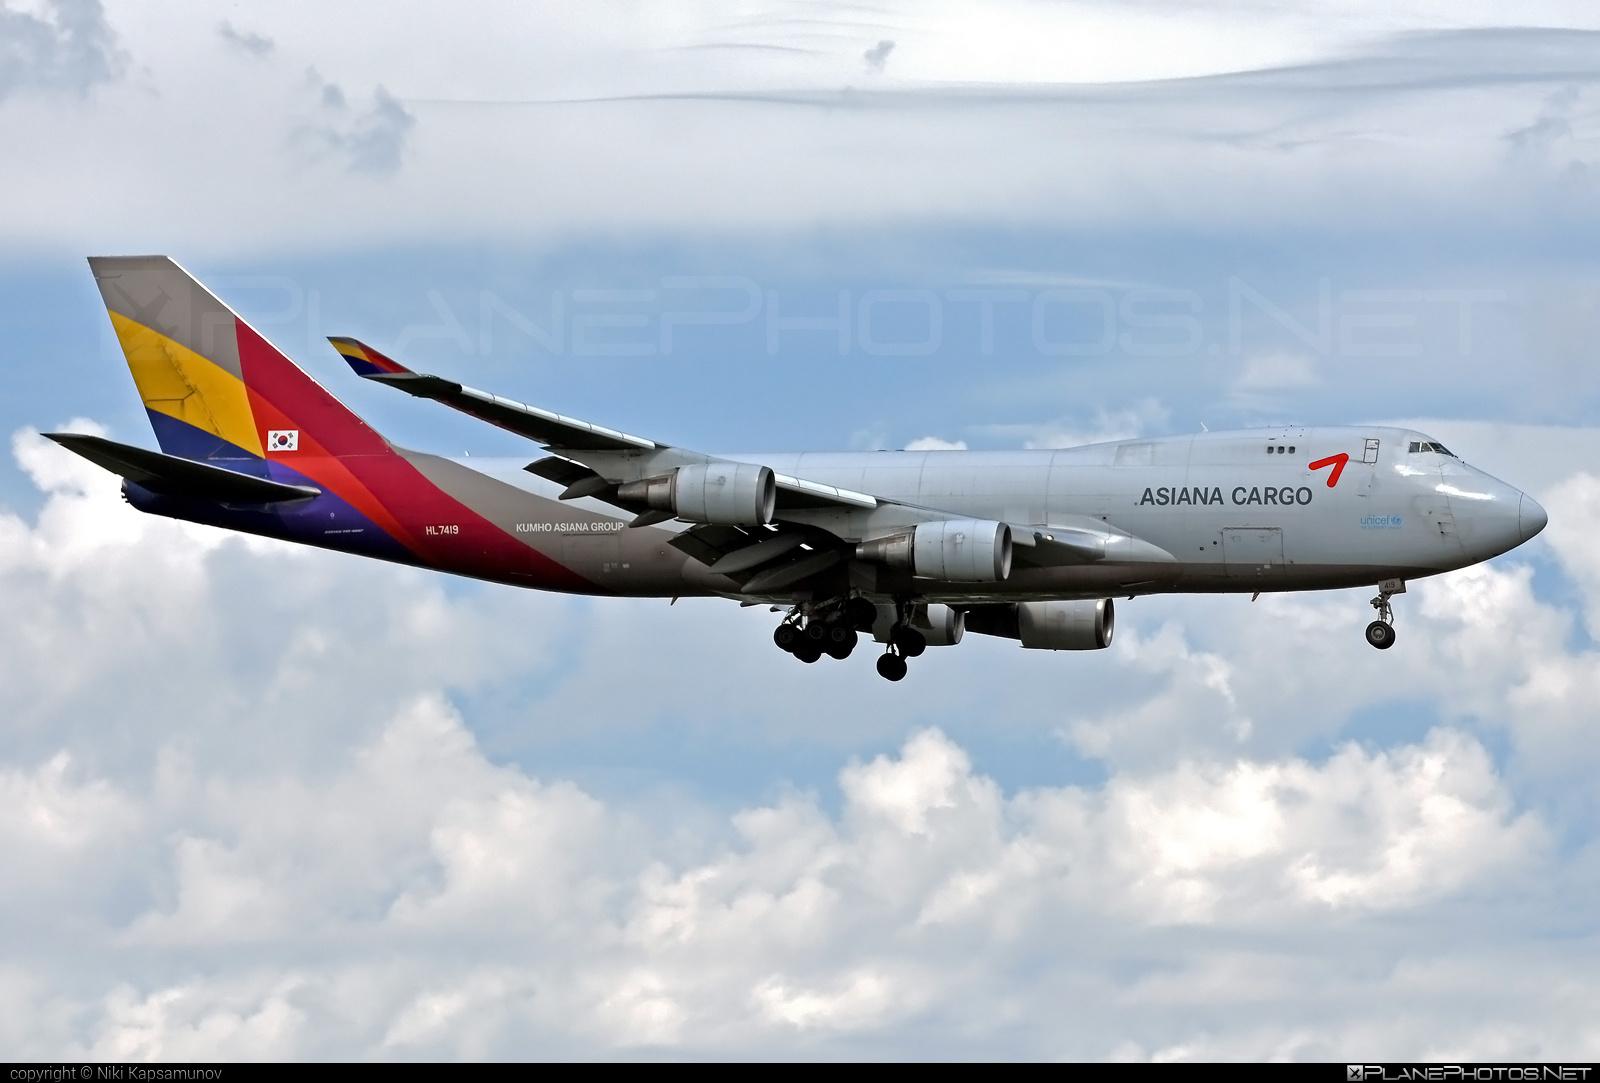 Boeing 747-400F - HL7419 operated by Asiana Cargo #asianacargo #b747 #boeing #boeing747 #jumbo